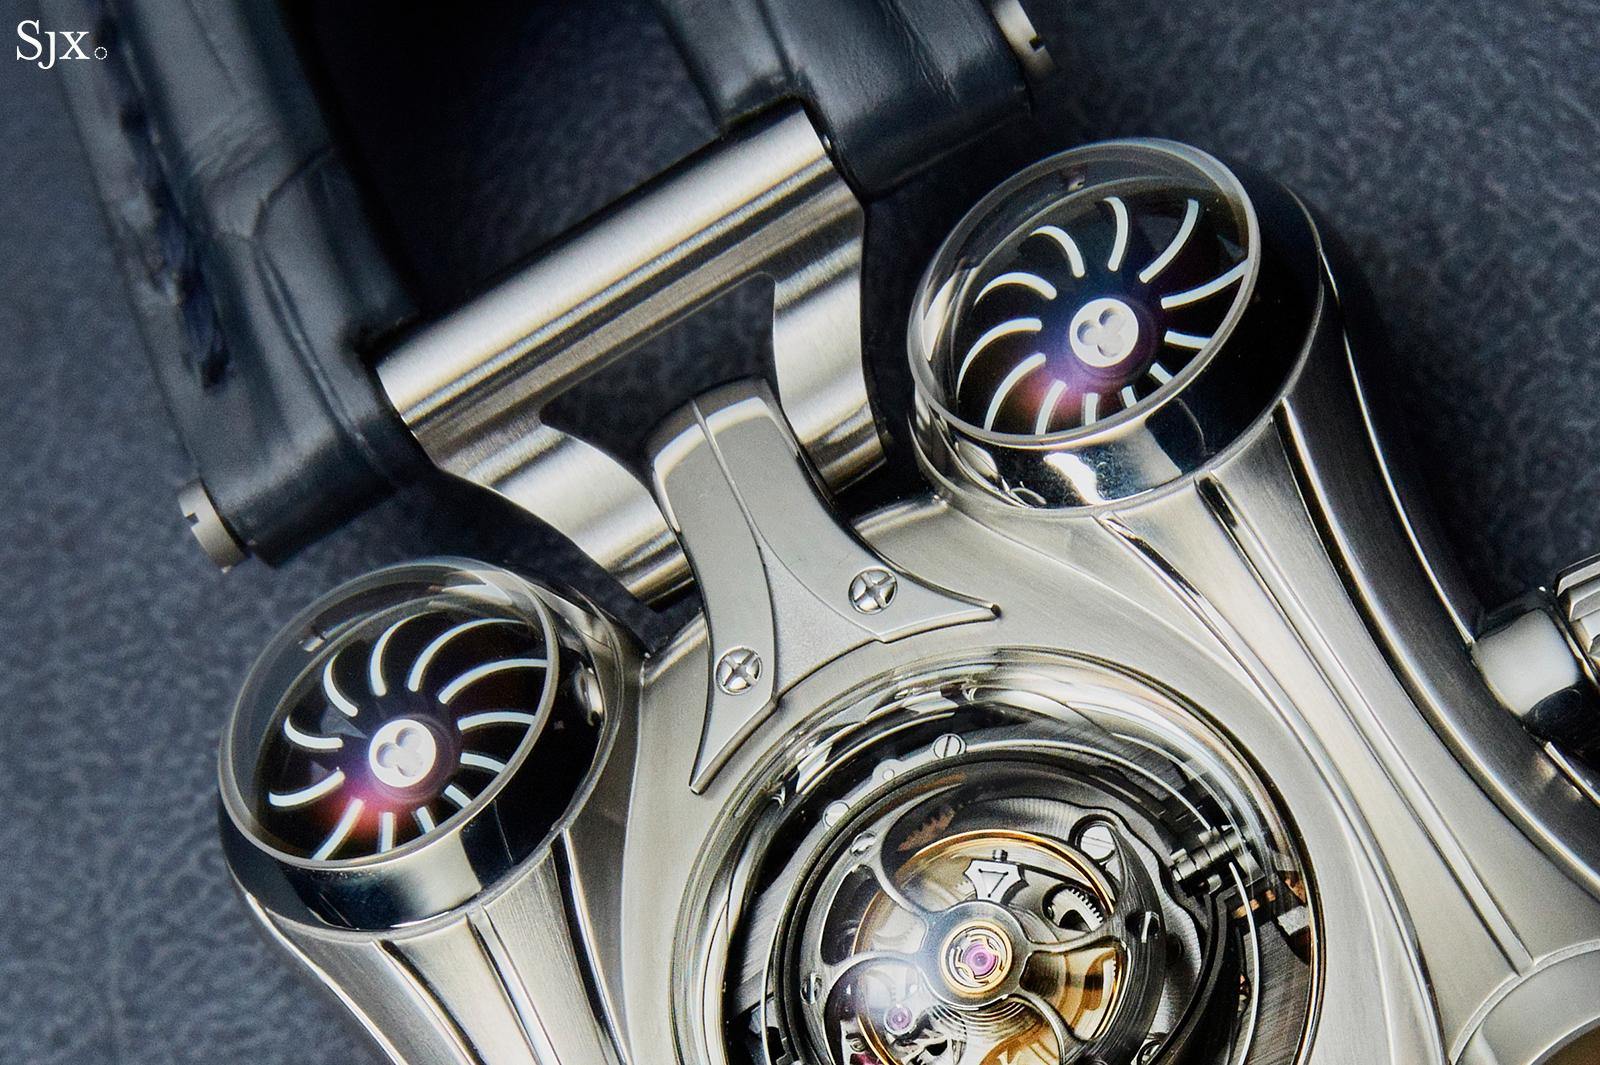 MB&F HM6 Final Edition turbine close up